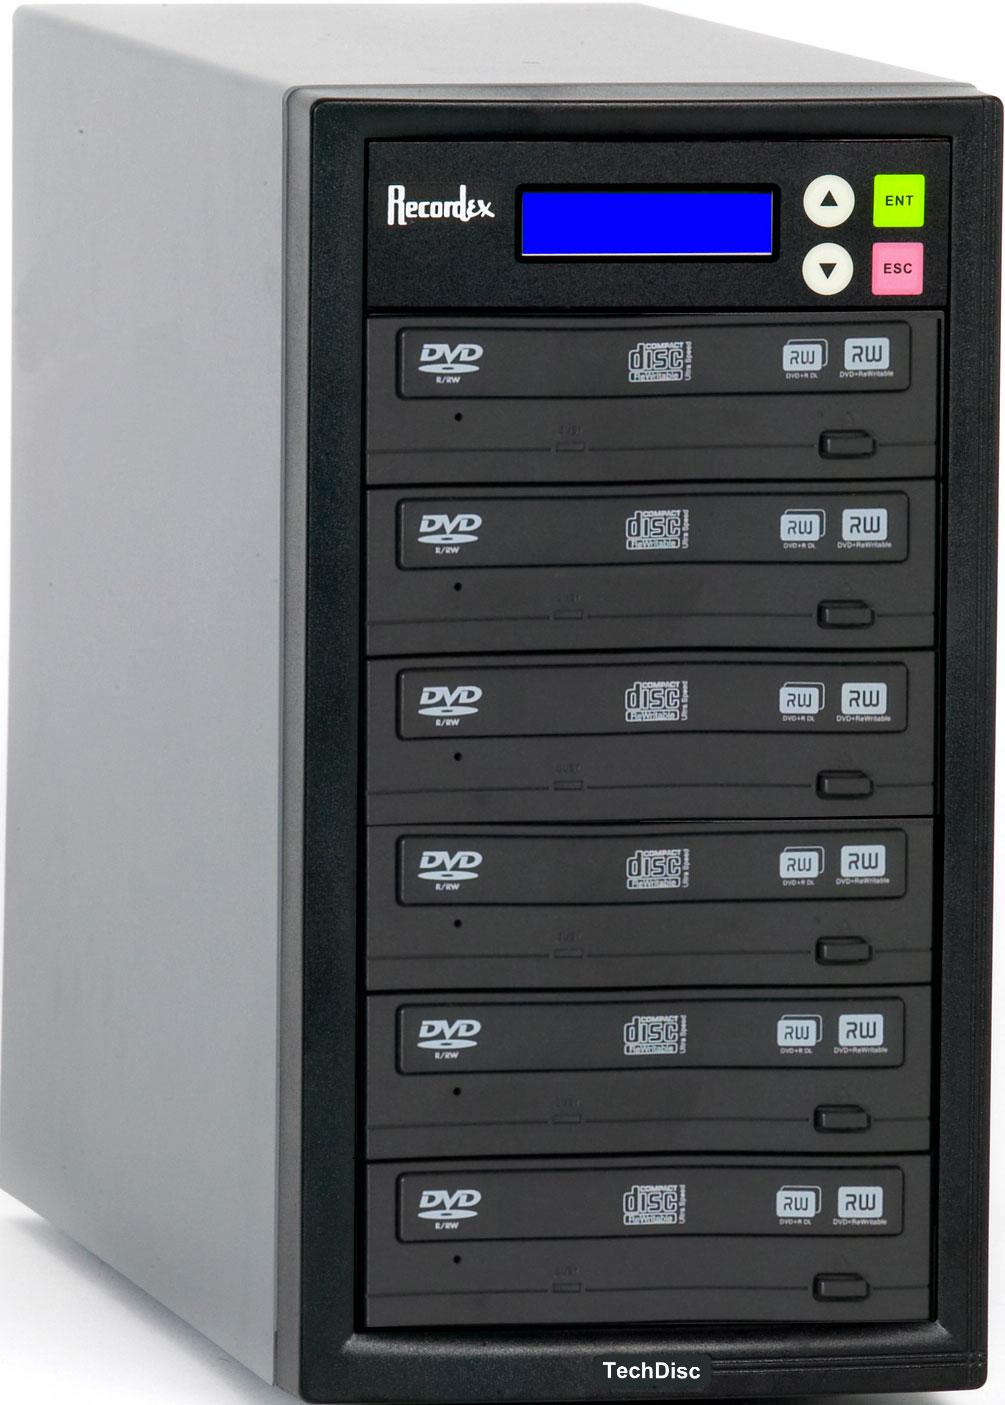 CD/DVD Duplicator with 5 Target Drives